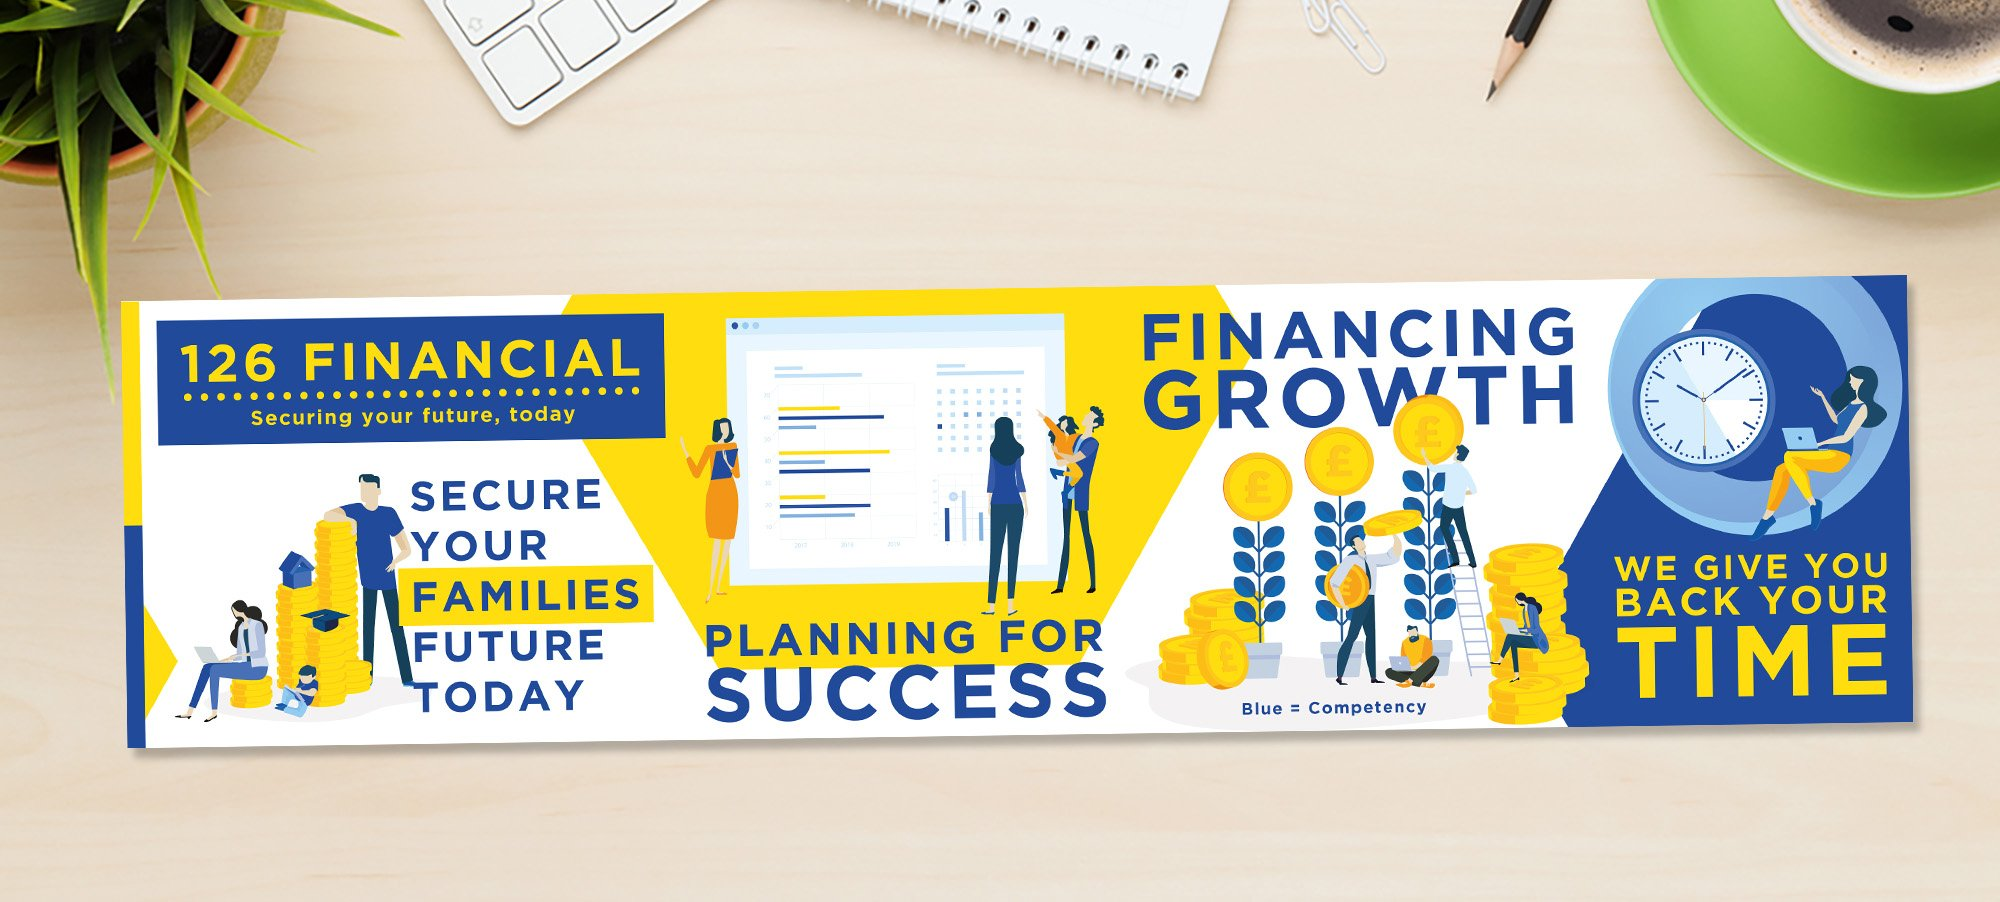 Brand exploration for 126 Financial UK